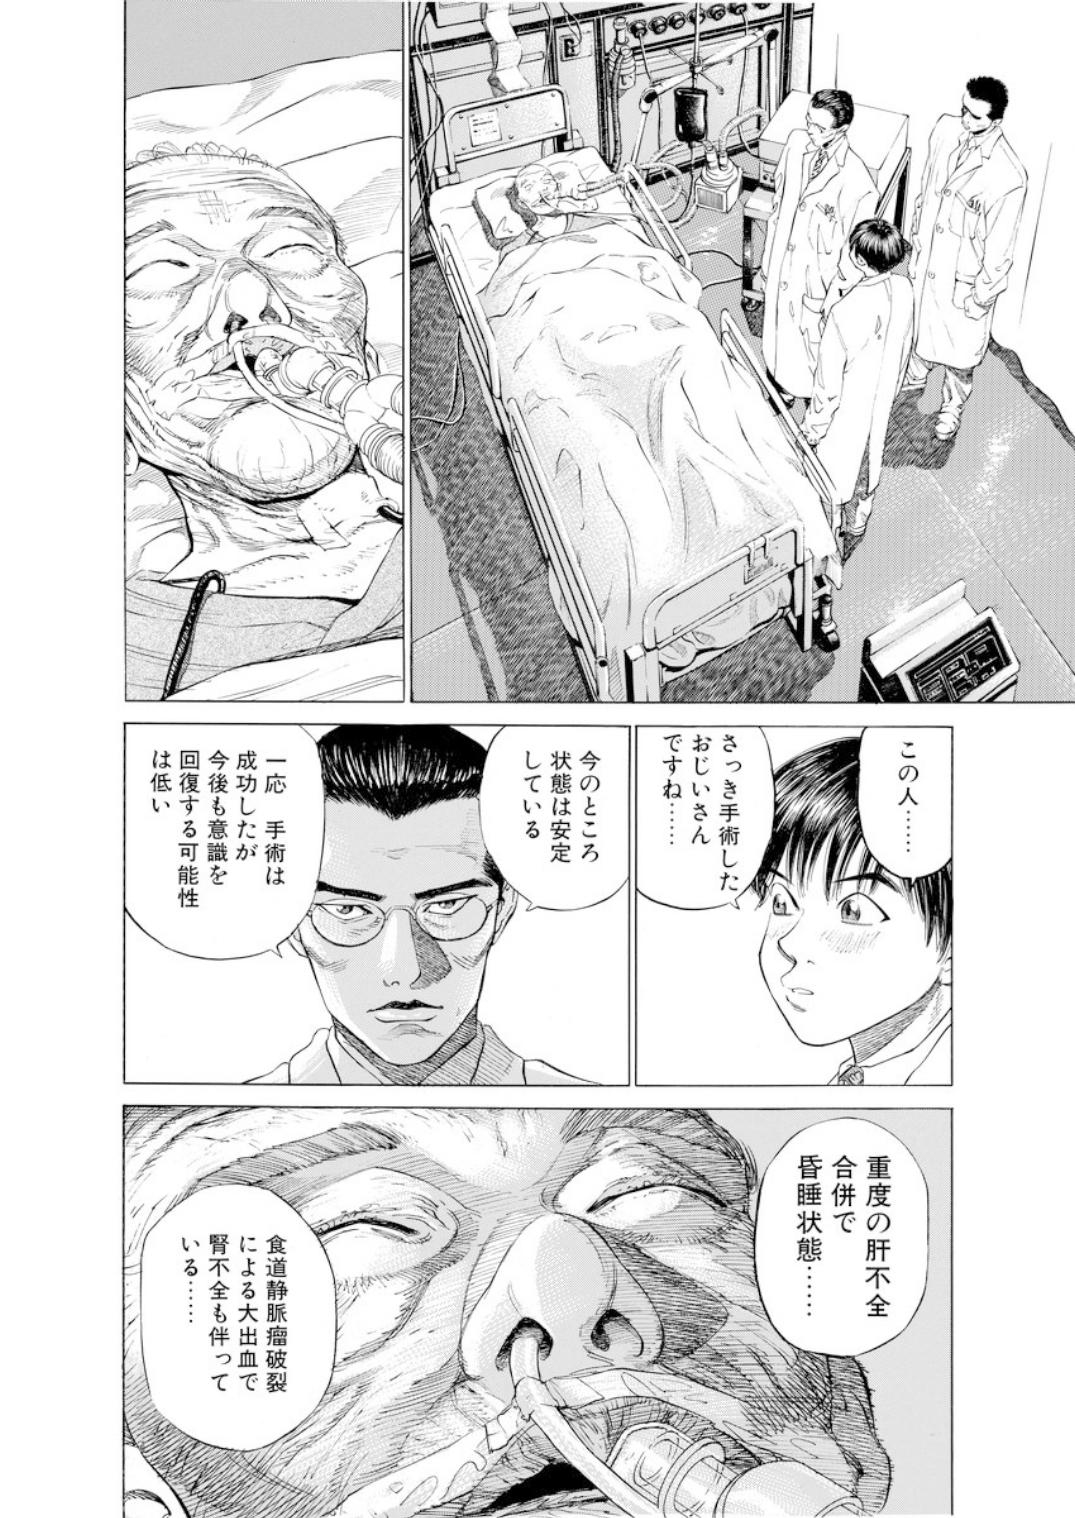 001bj_page-0080.jpg